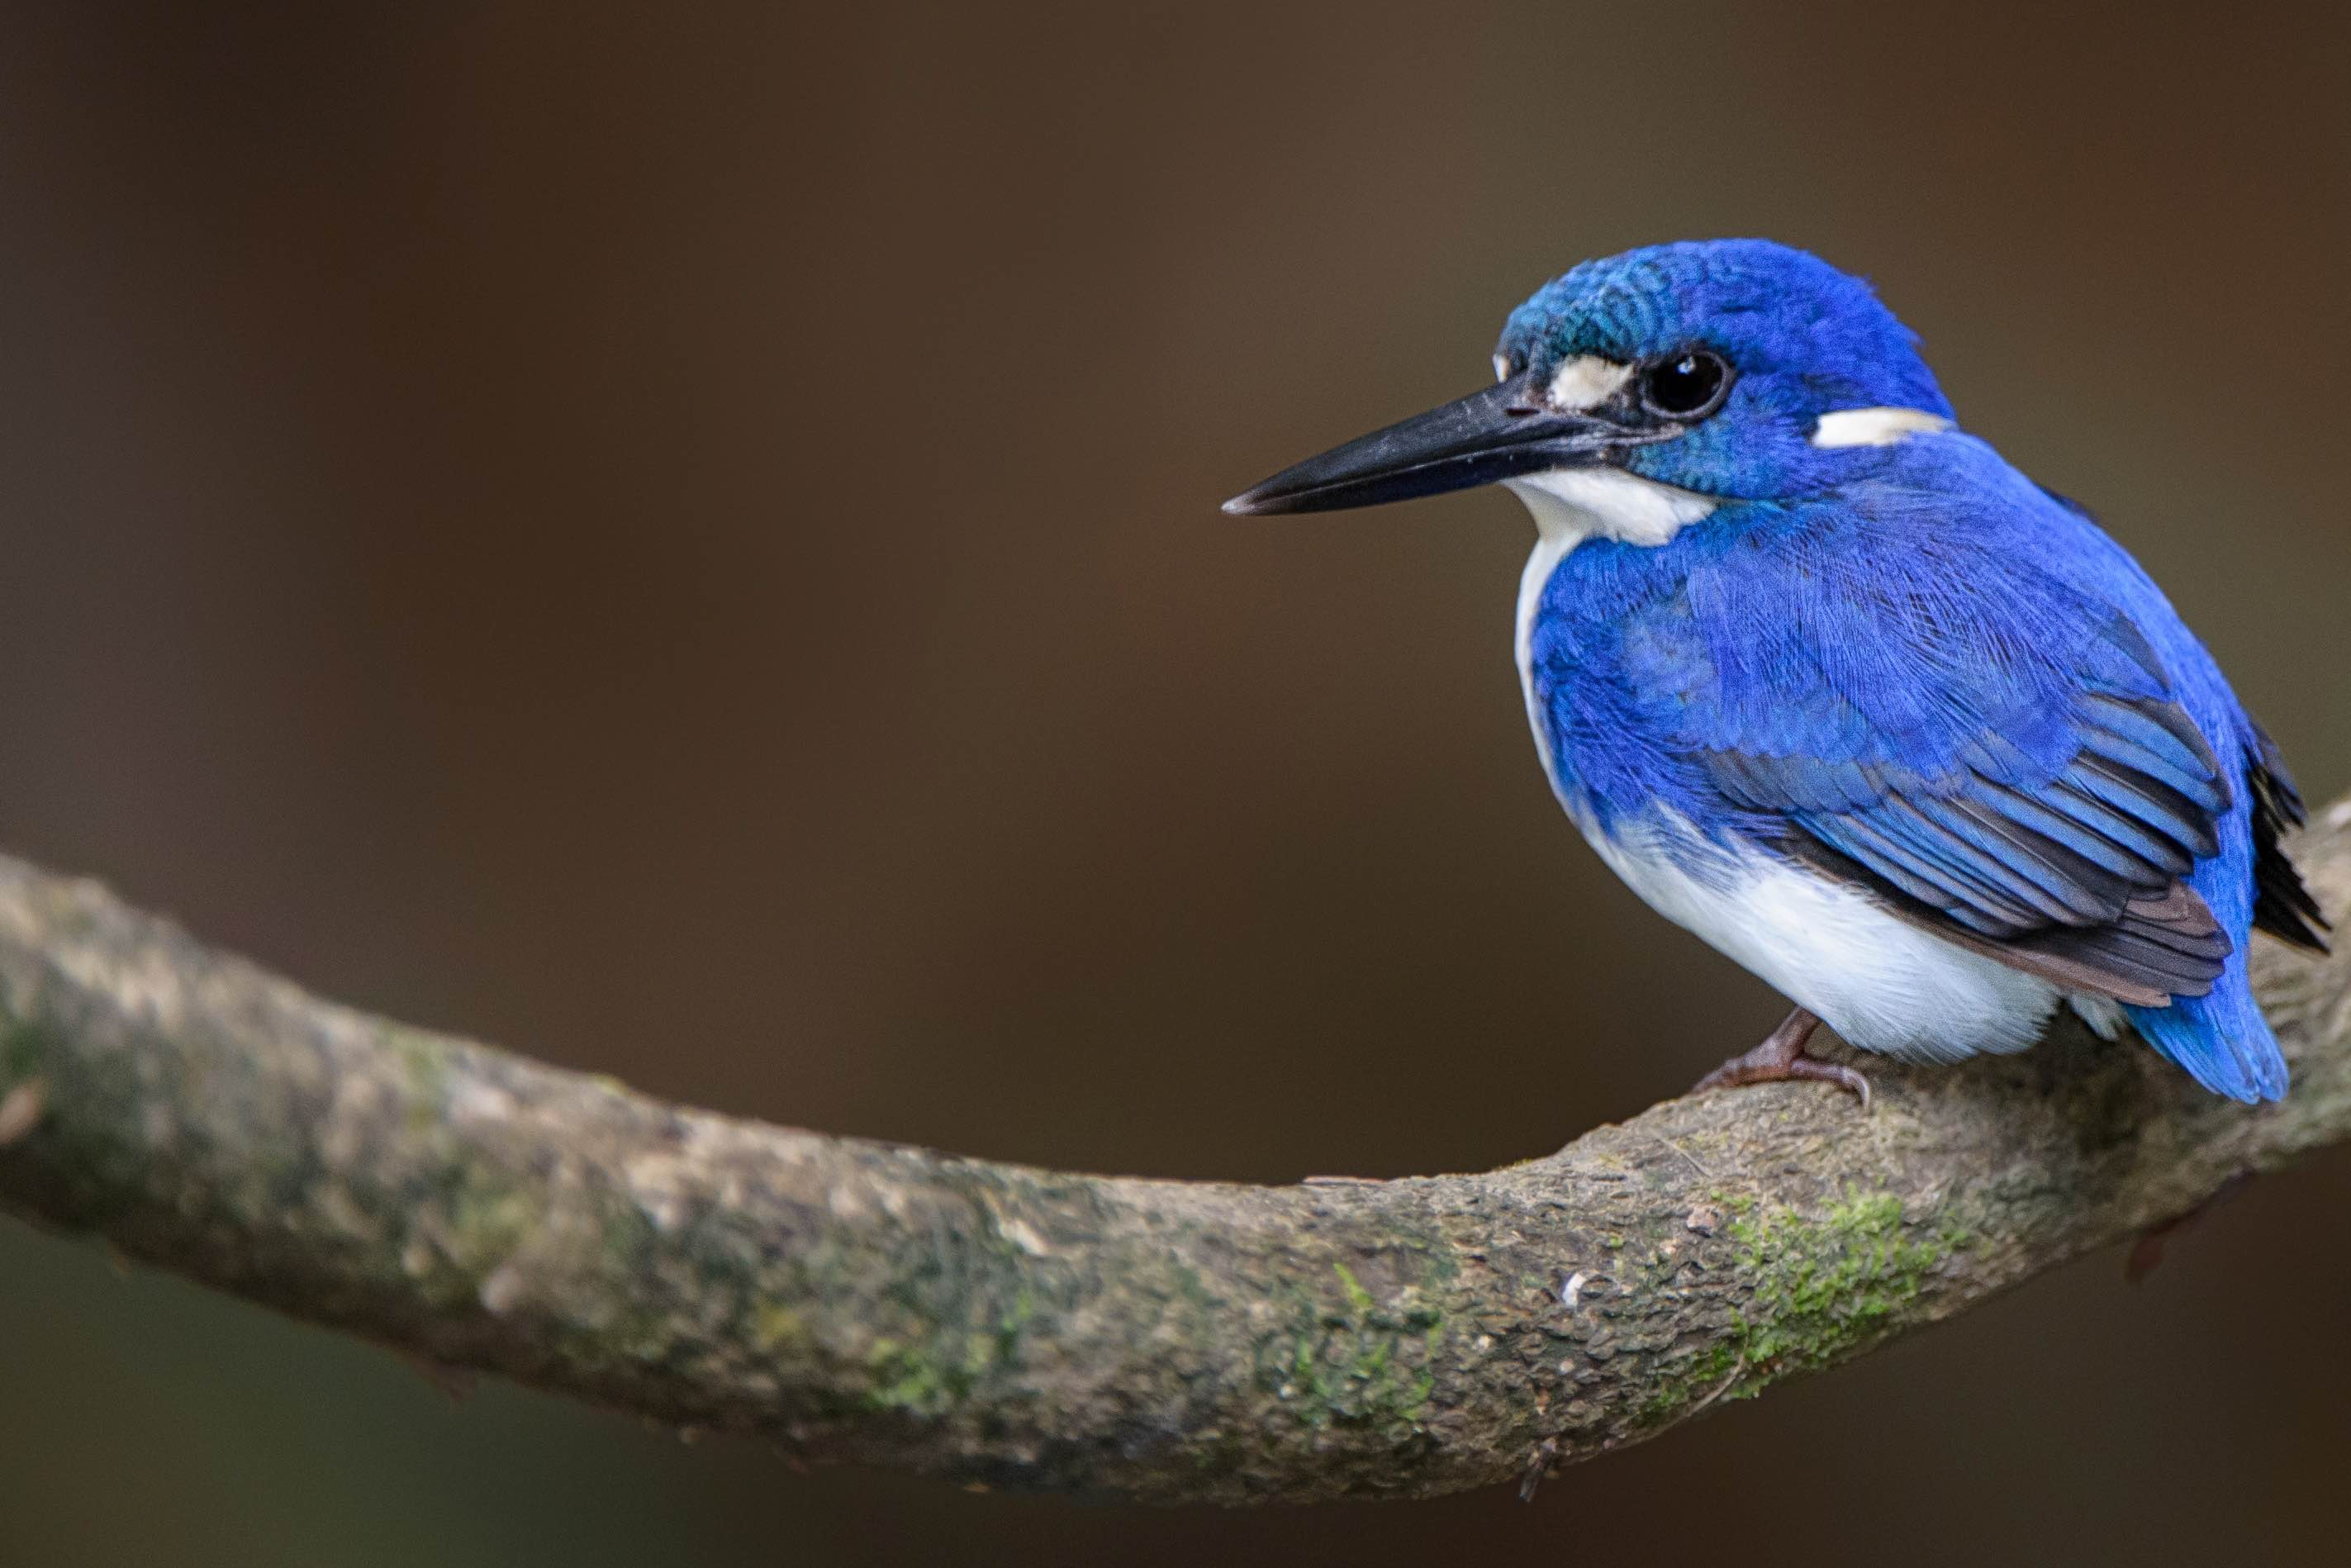 Little Kingfisher (Photo: Tony Whitehead)